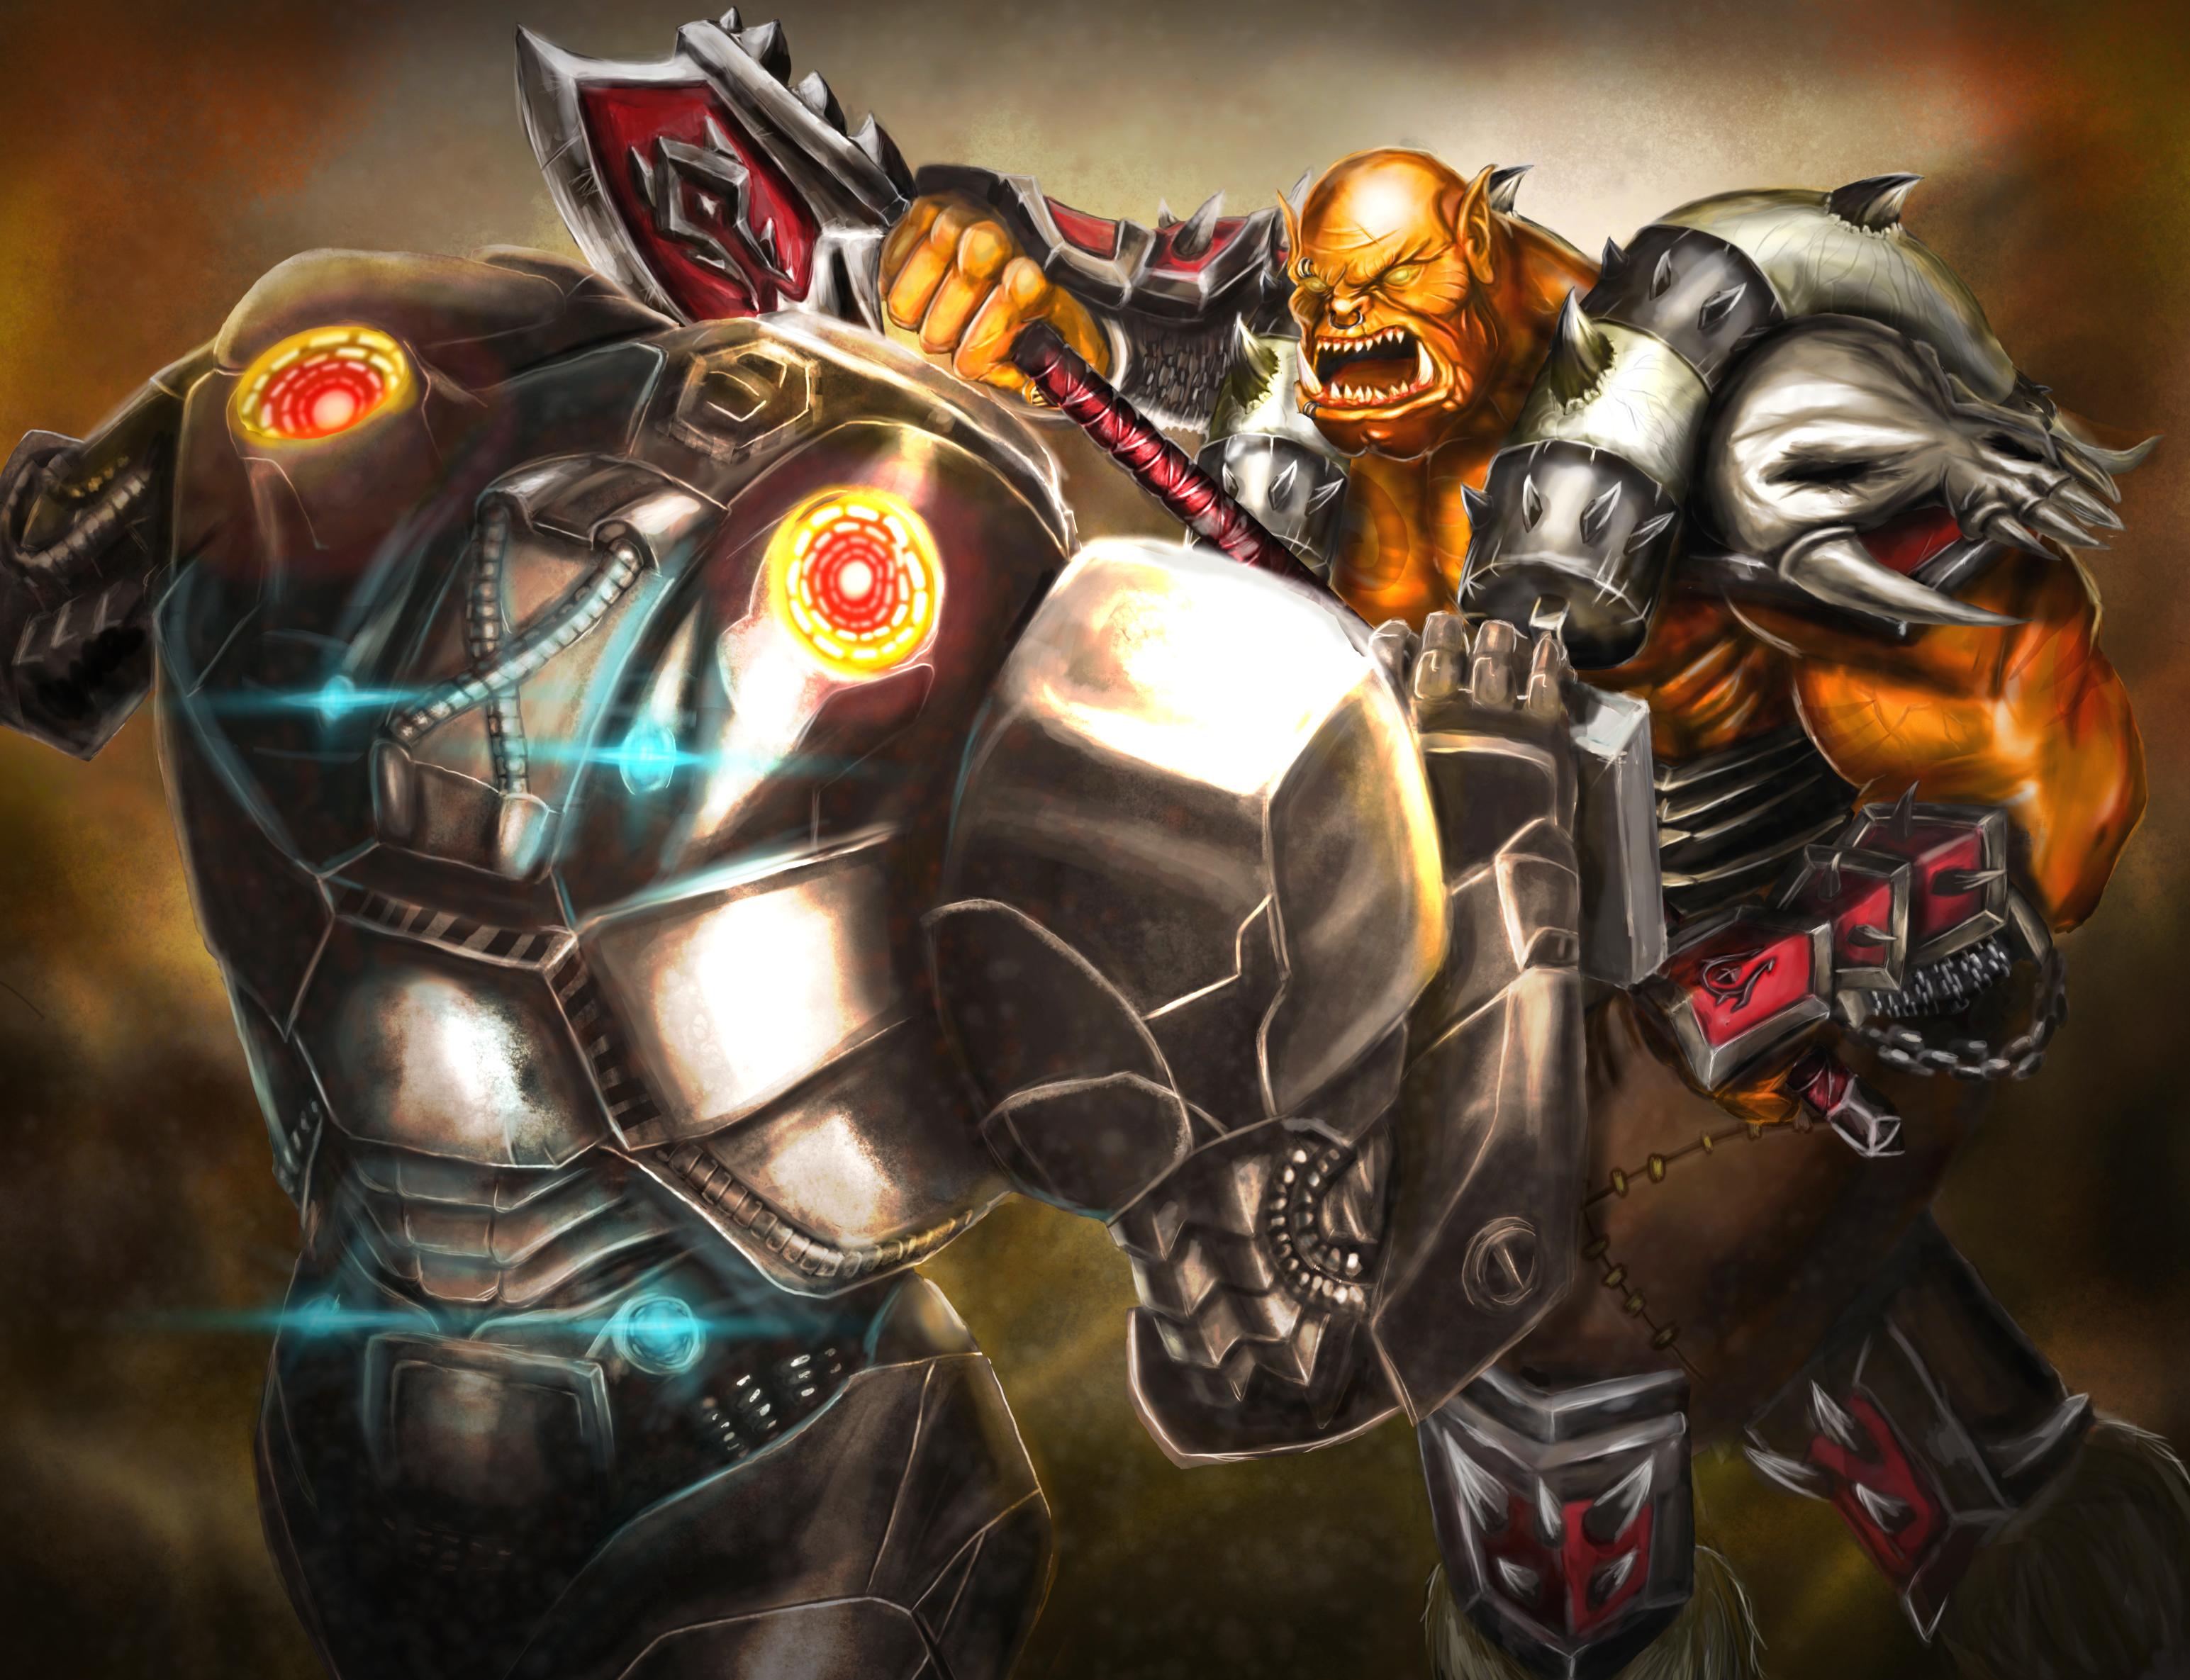 World of warcraft vs Stracraft